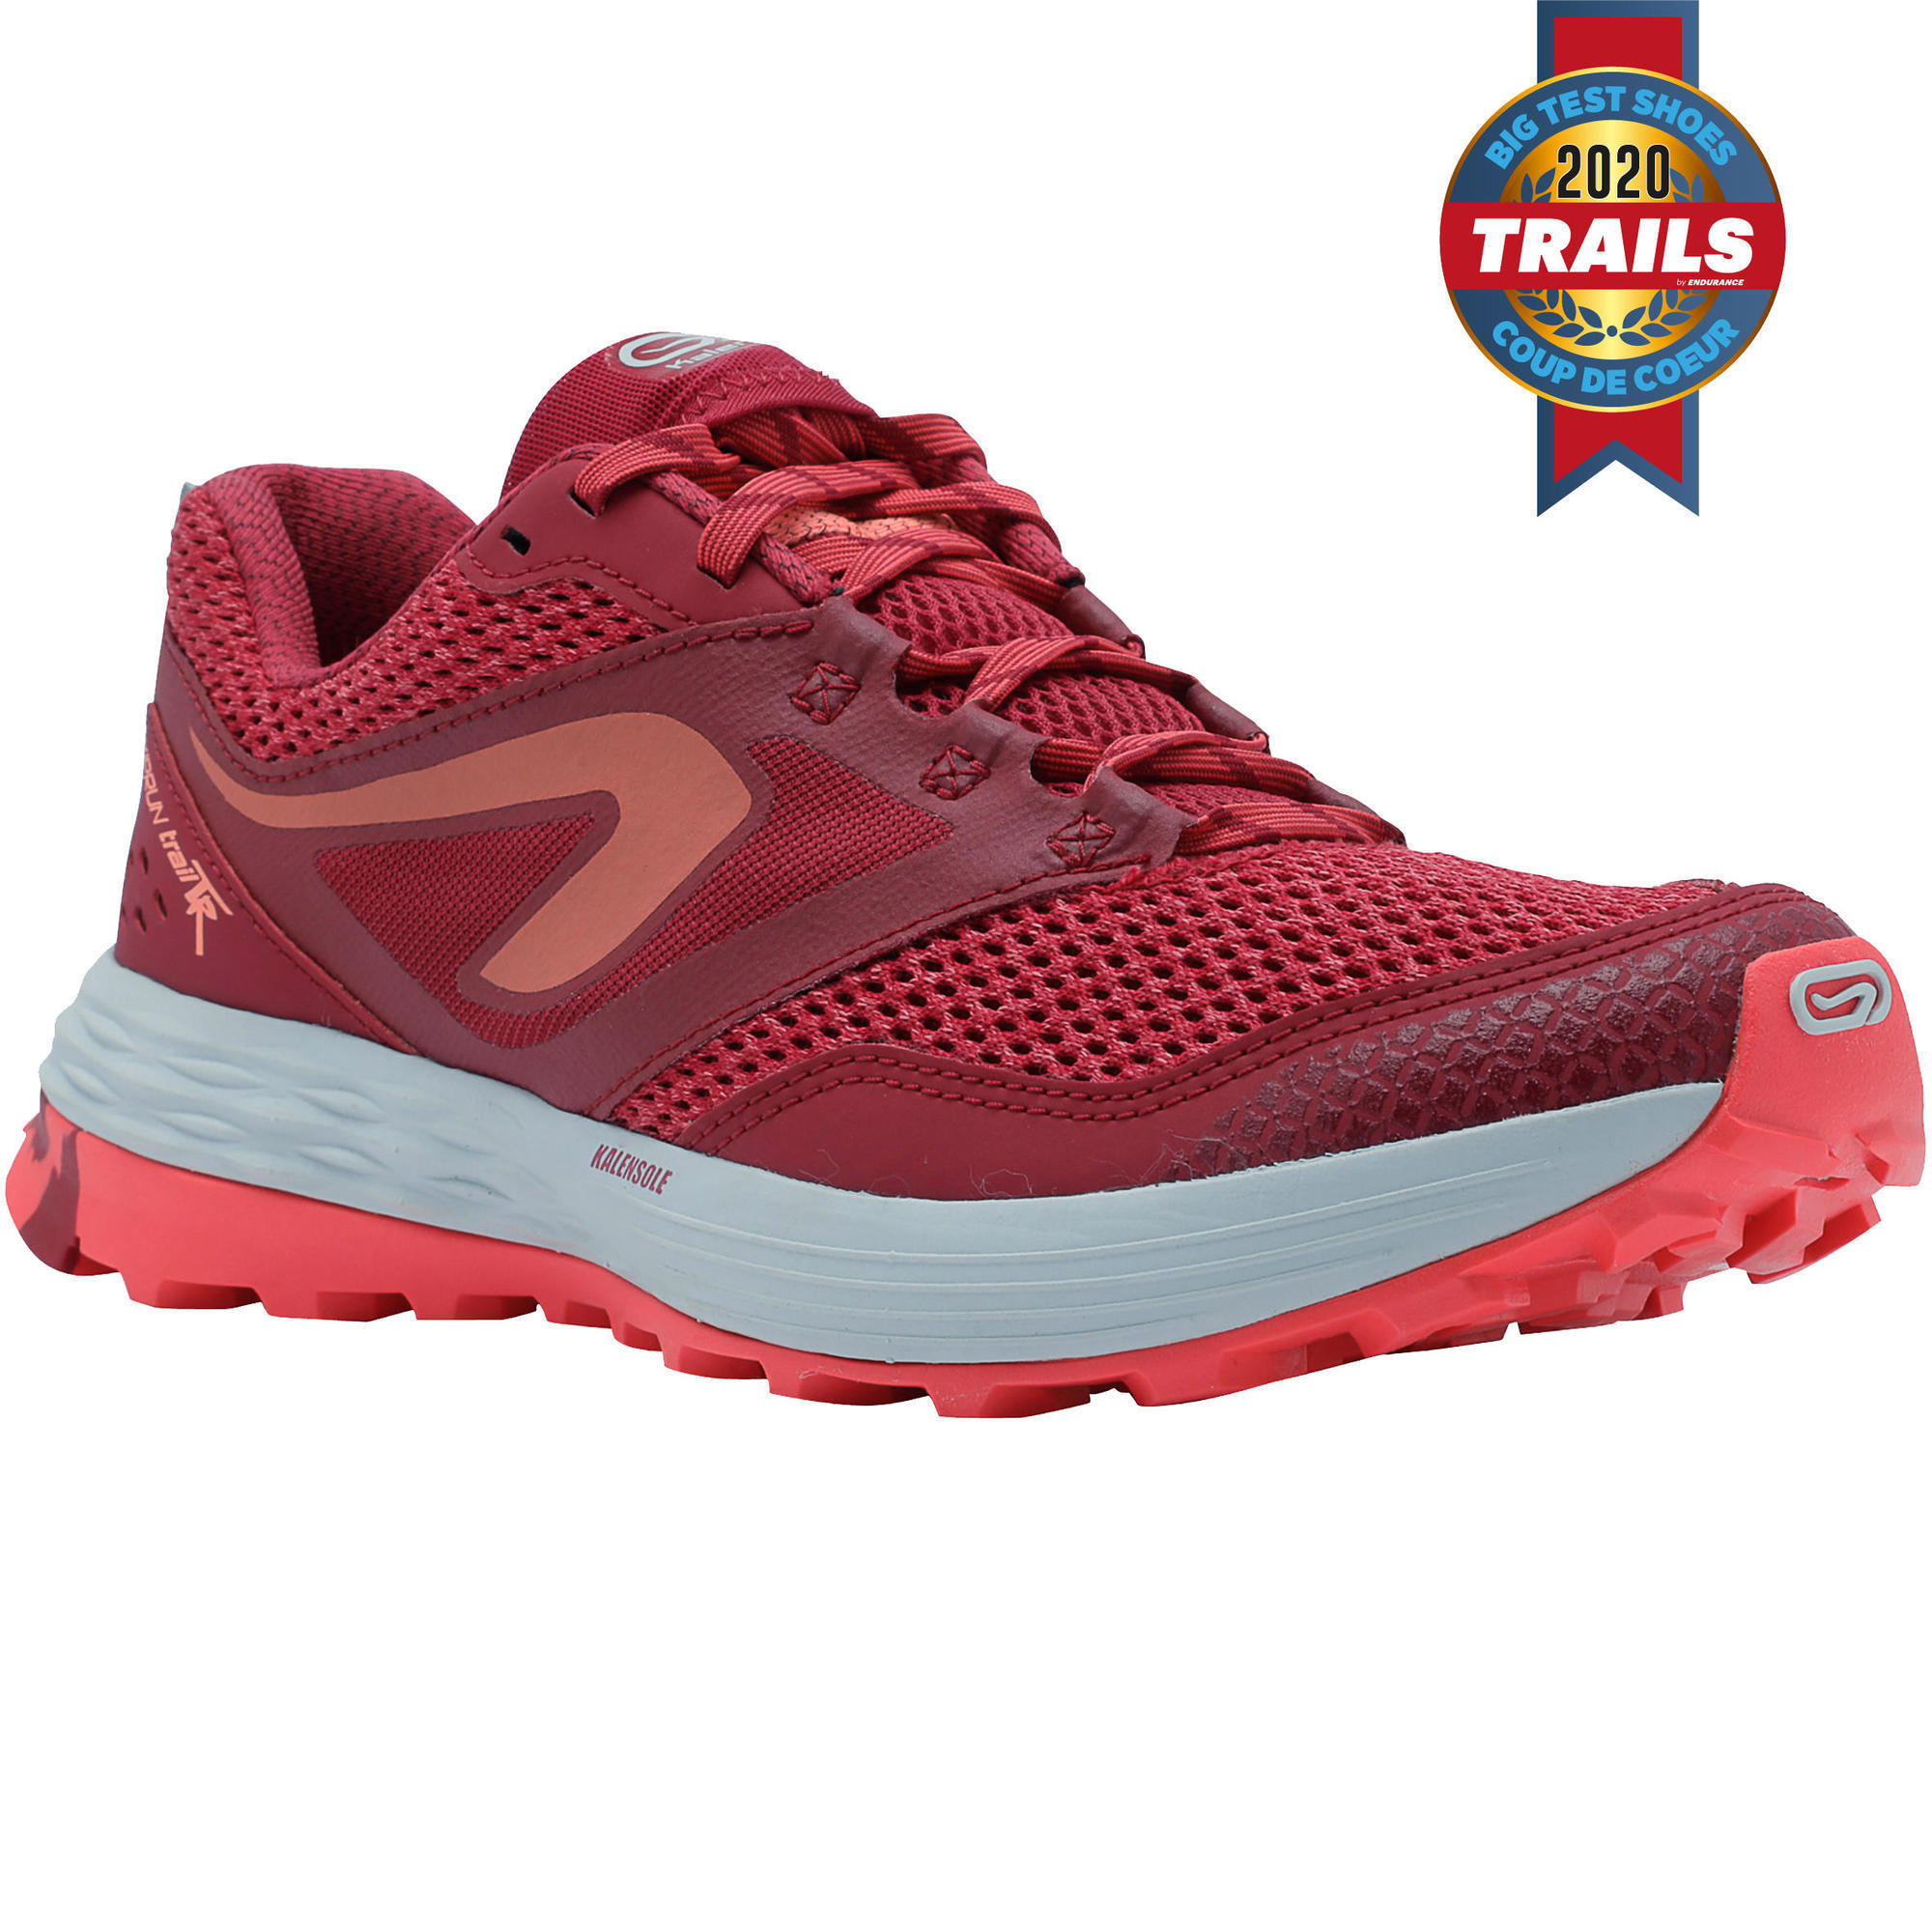 Trail Running Shoes - Decathlon